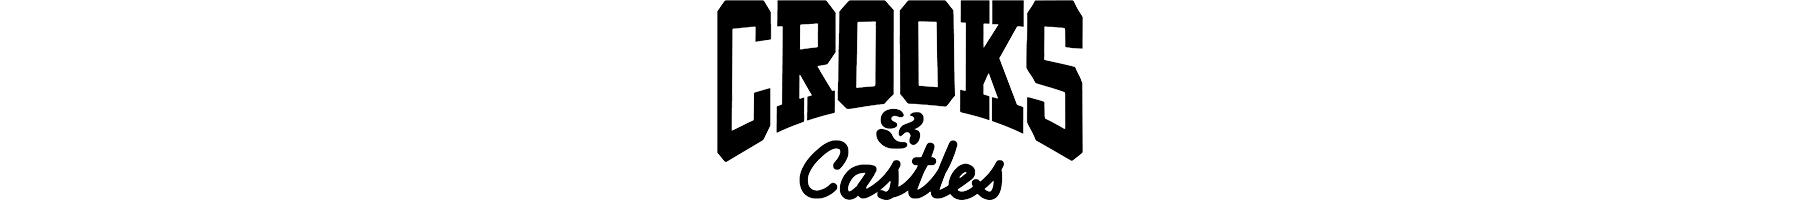 DrJays.com - Crooks & Castles